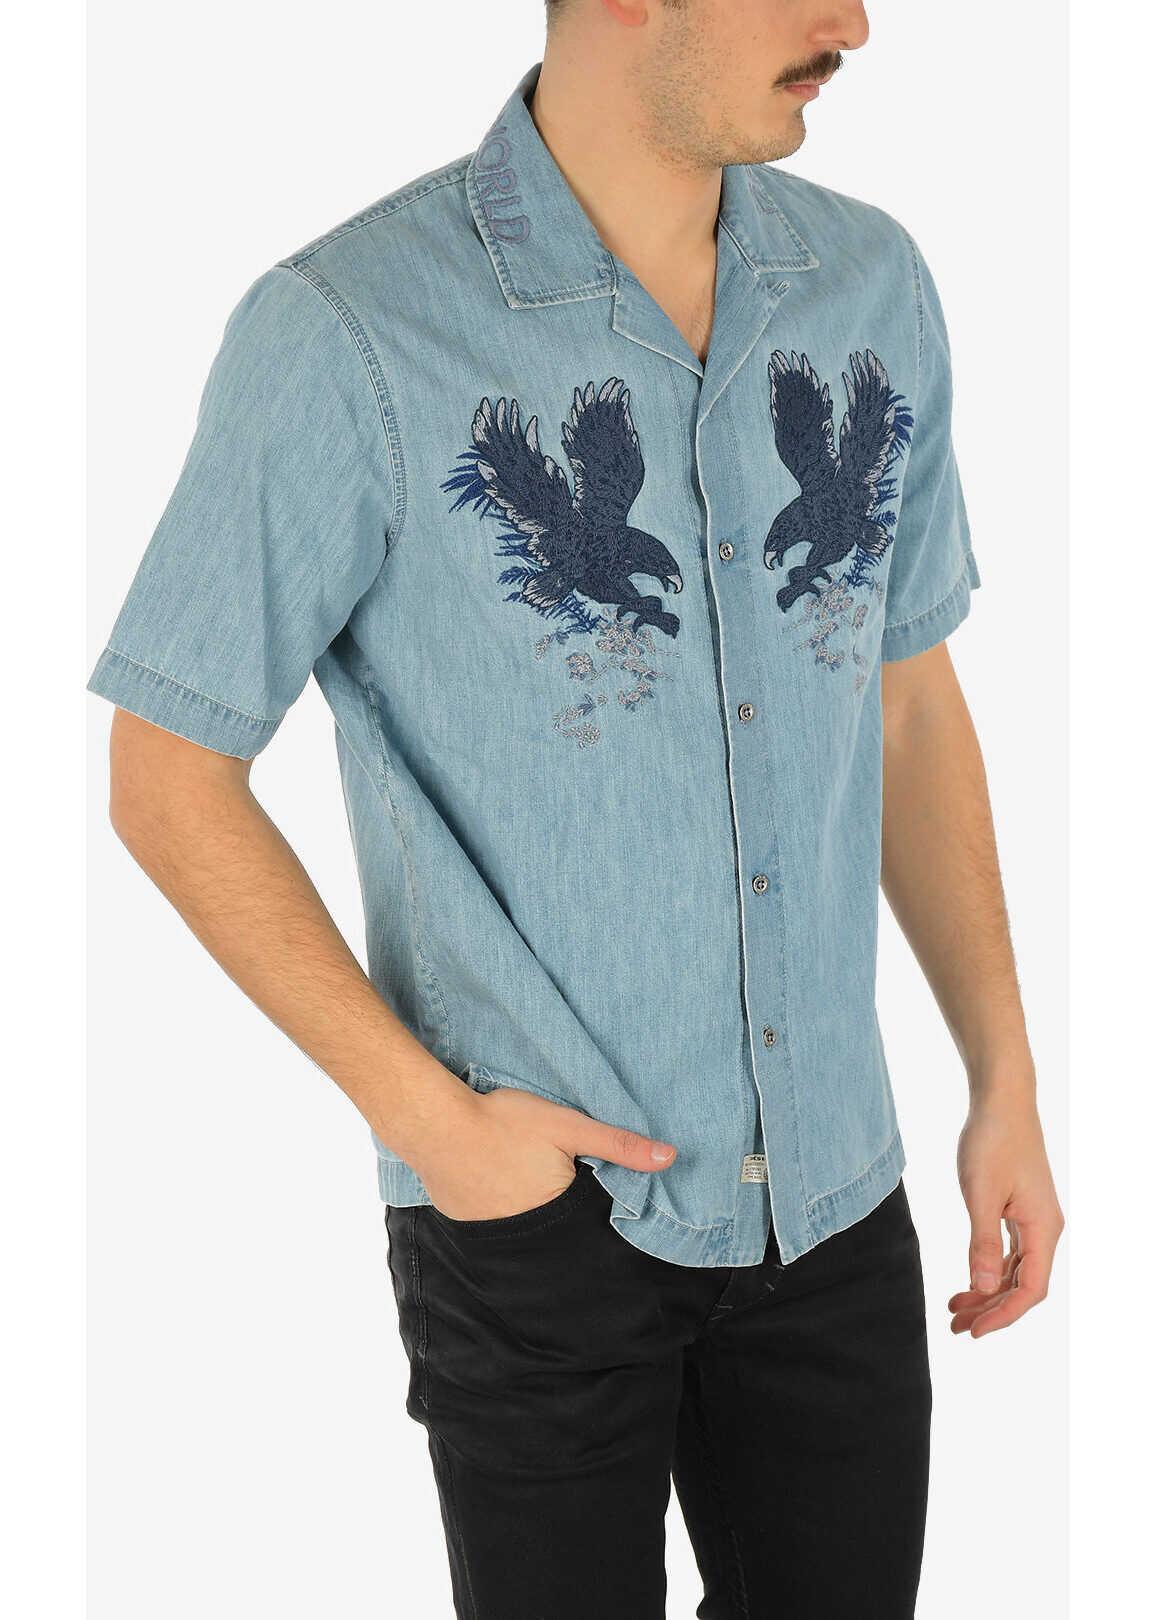 Diesel Embroidered Denim D-RASHI Shirt with Short Sleeve BLUE imagine